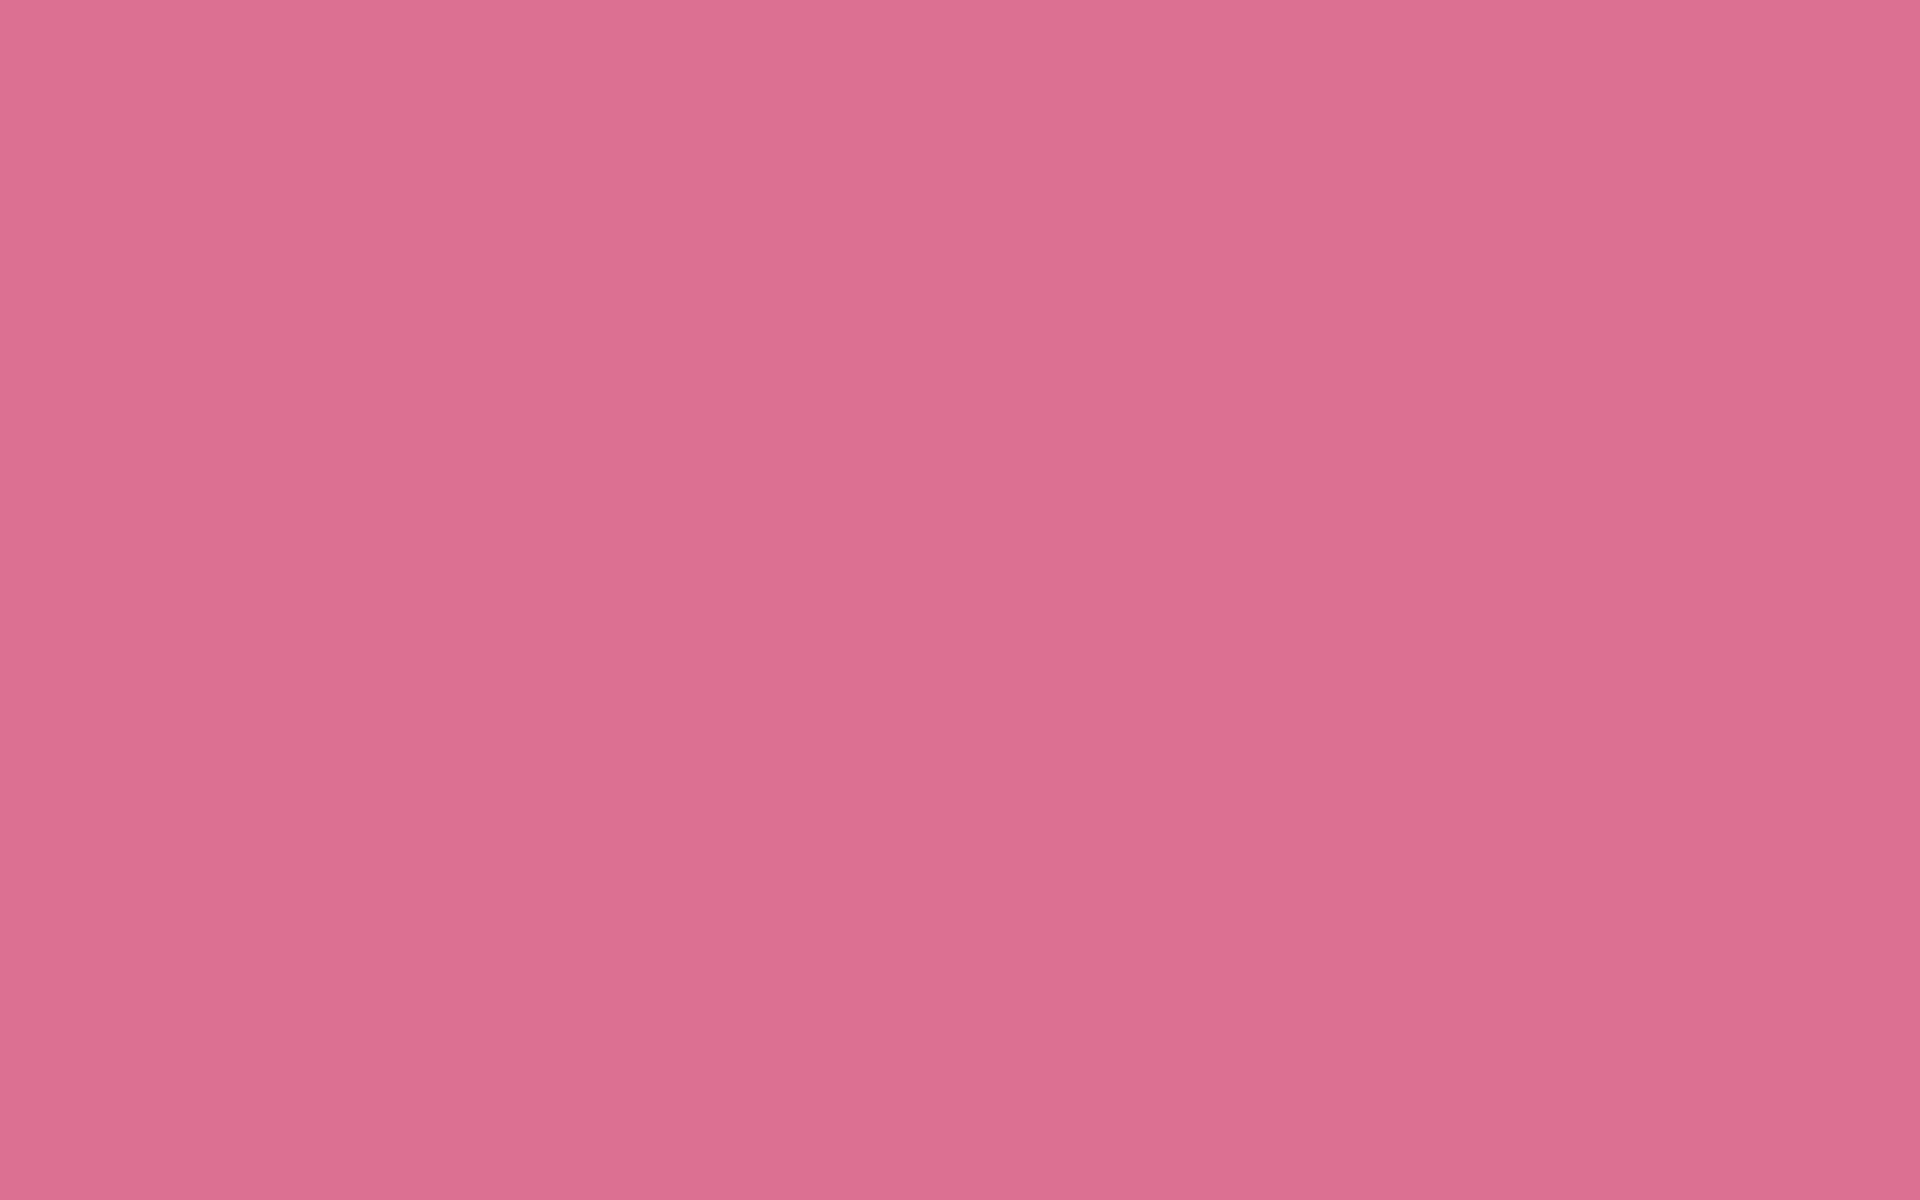 1920x1200 Pale Red-violet Solid Color Background